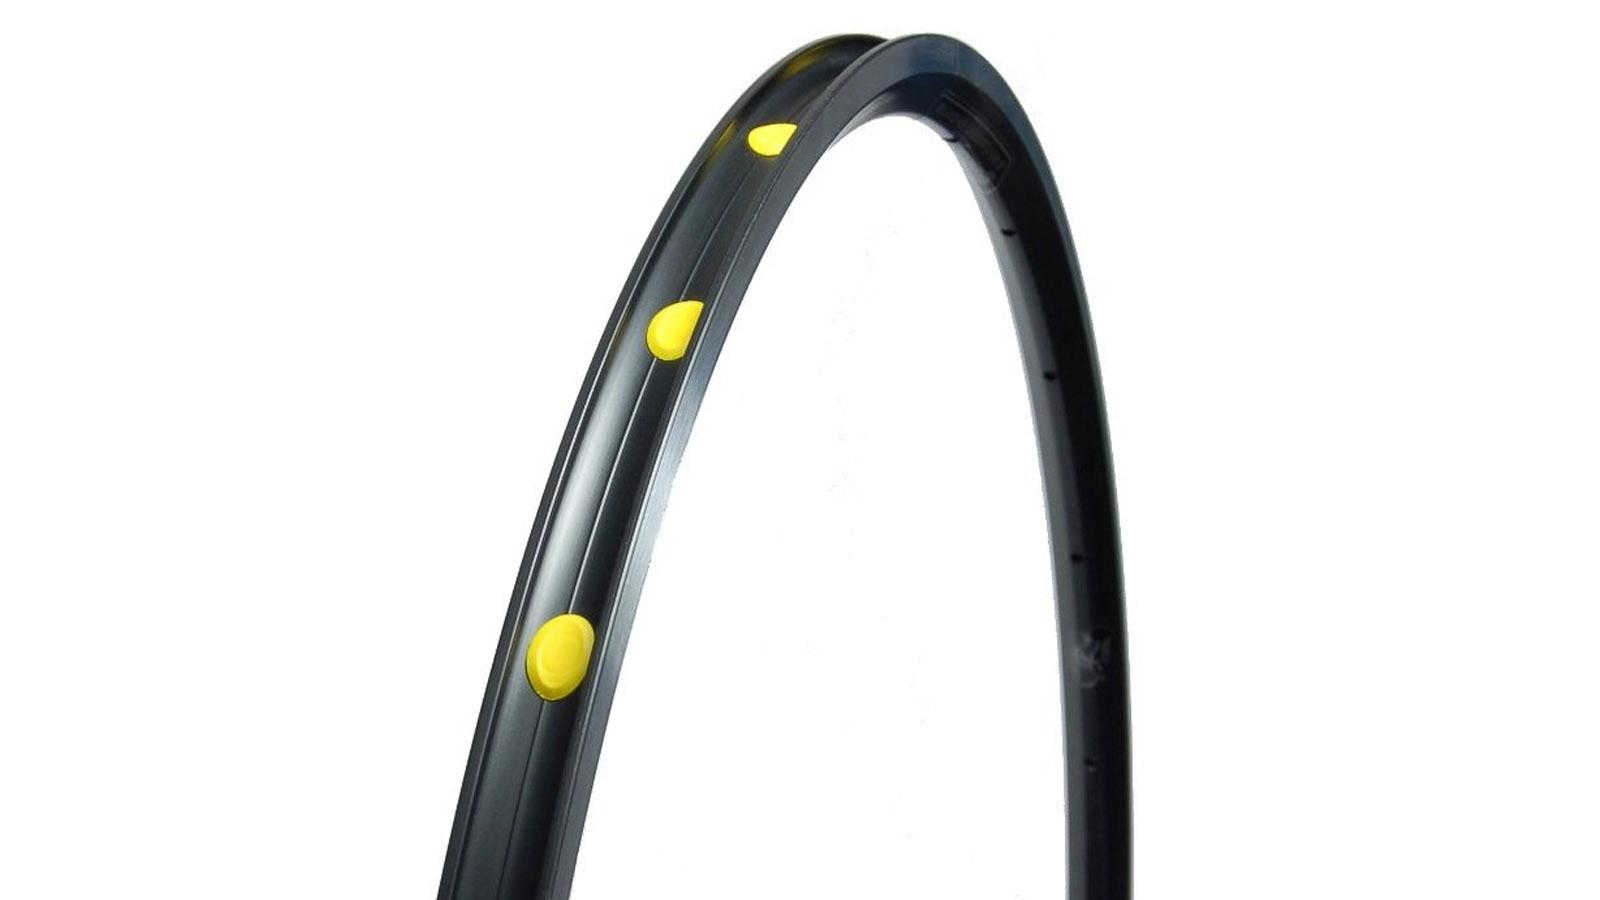 Velo plugs are a rim tape alternative